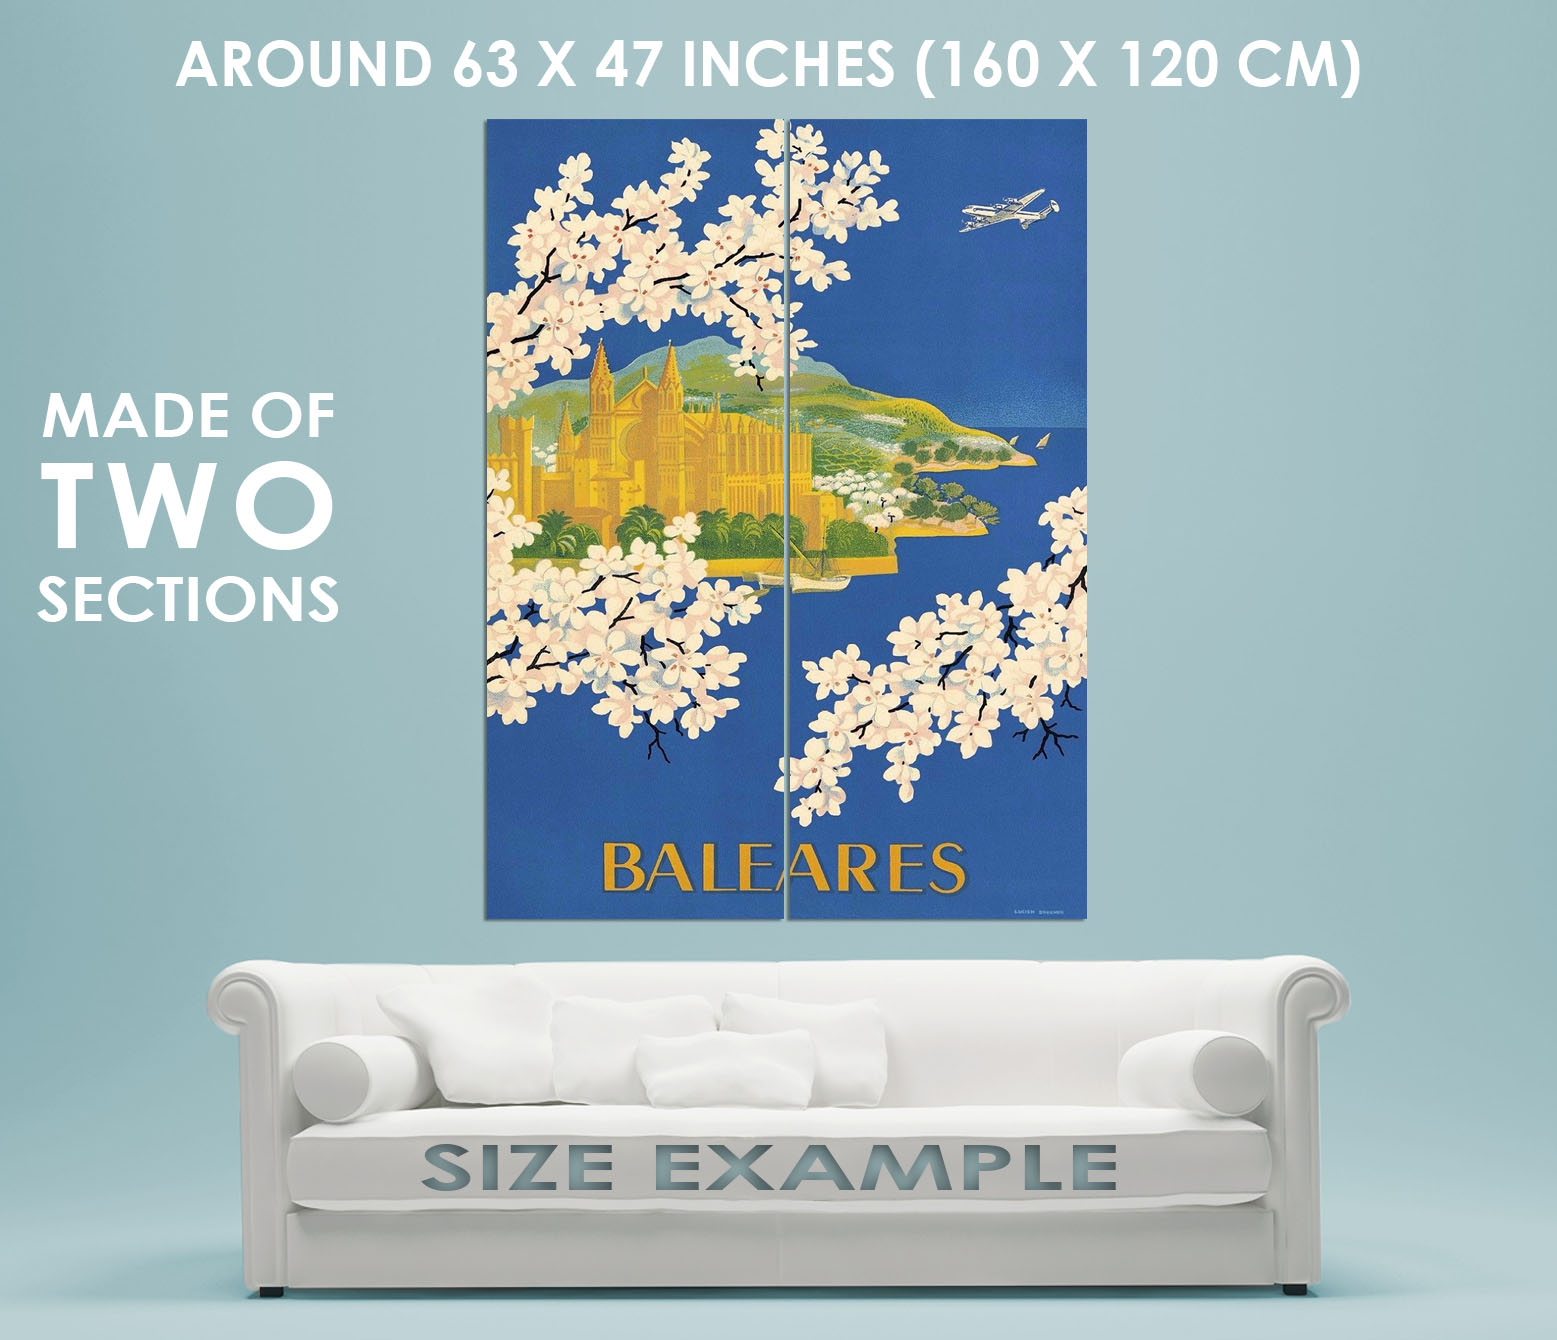 96694-Baleares-Balearic-Islands-Spain-Mallorca-Travel-Decor-WALL-PRINT-POSTER-FR